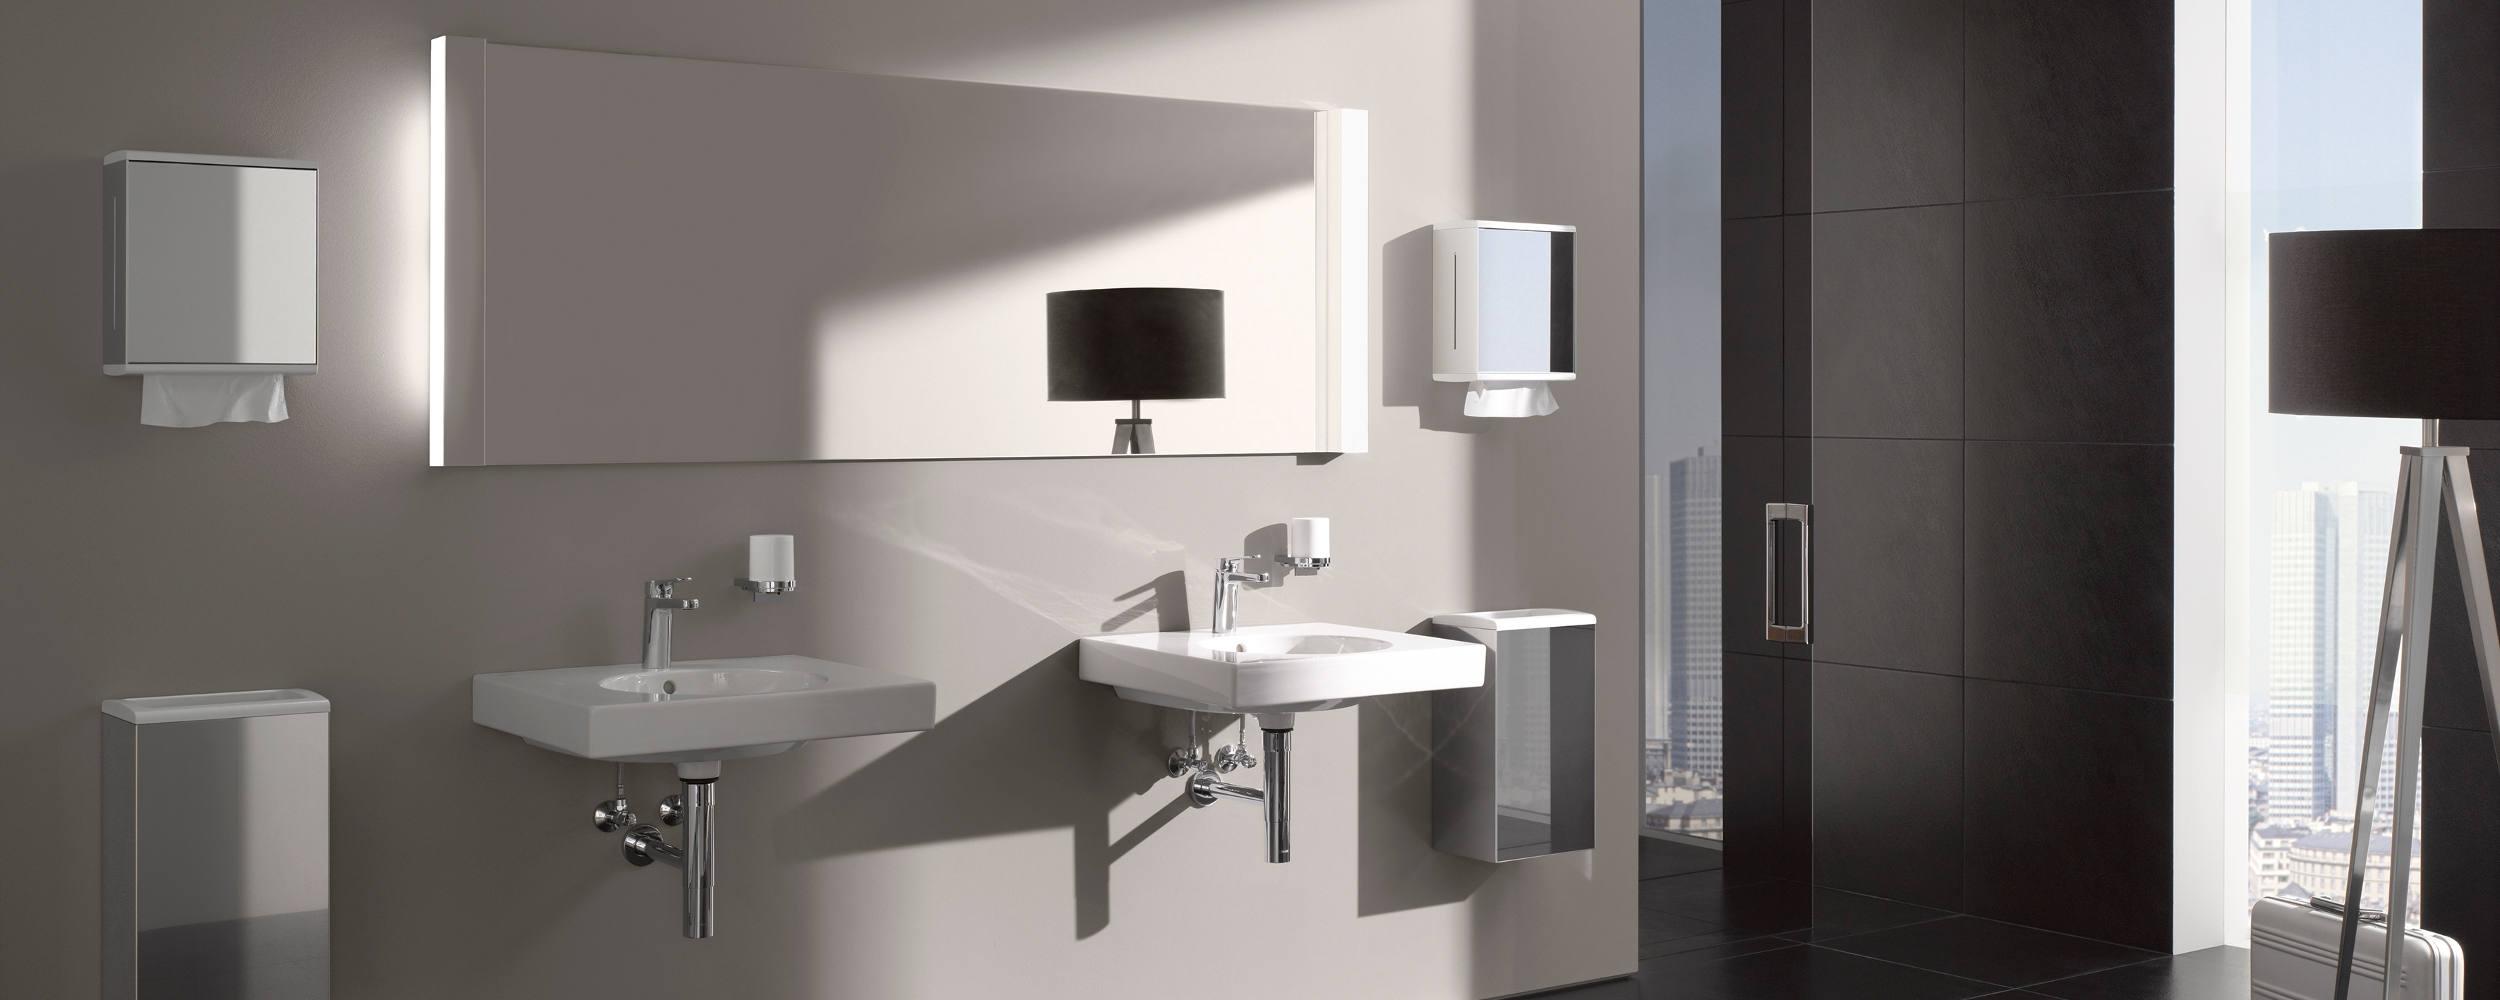 Modern Bathroom Designs Edinburgh Contemporary Bathroom